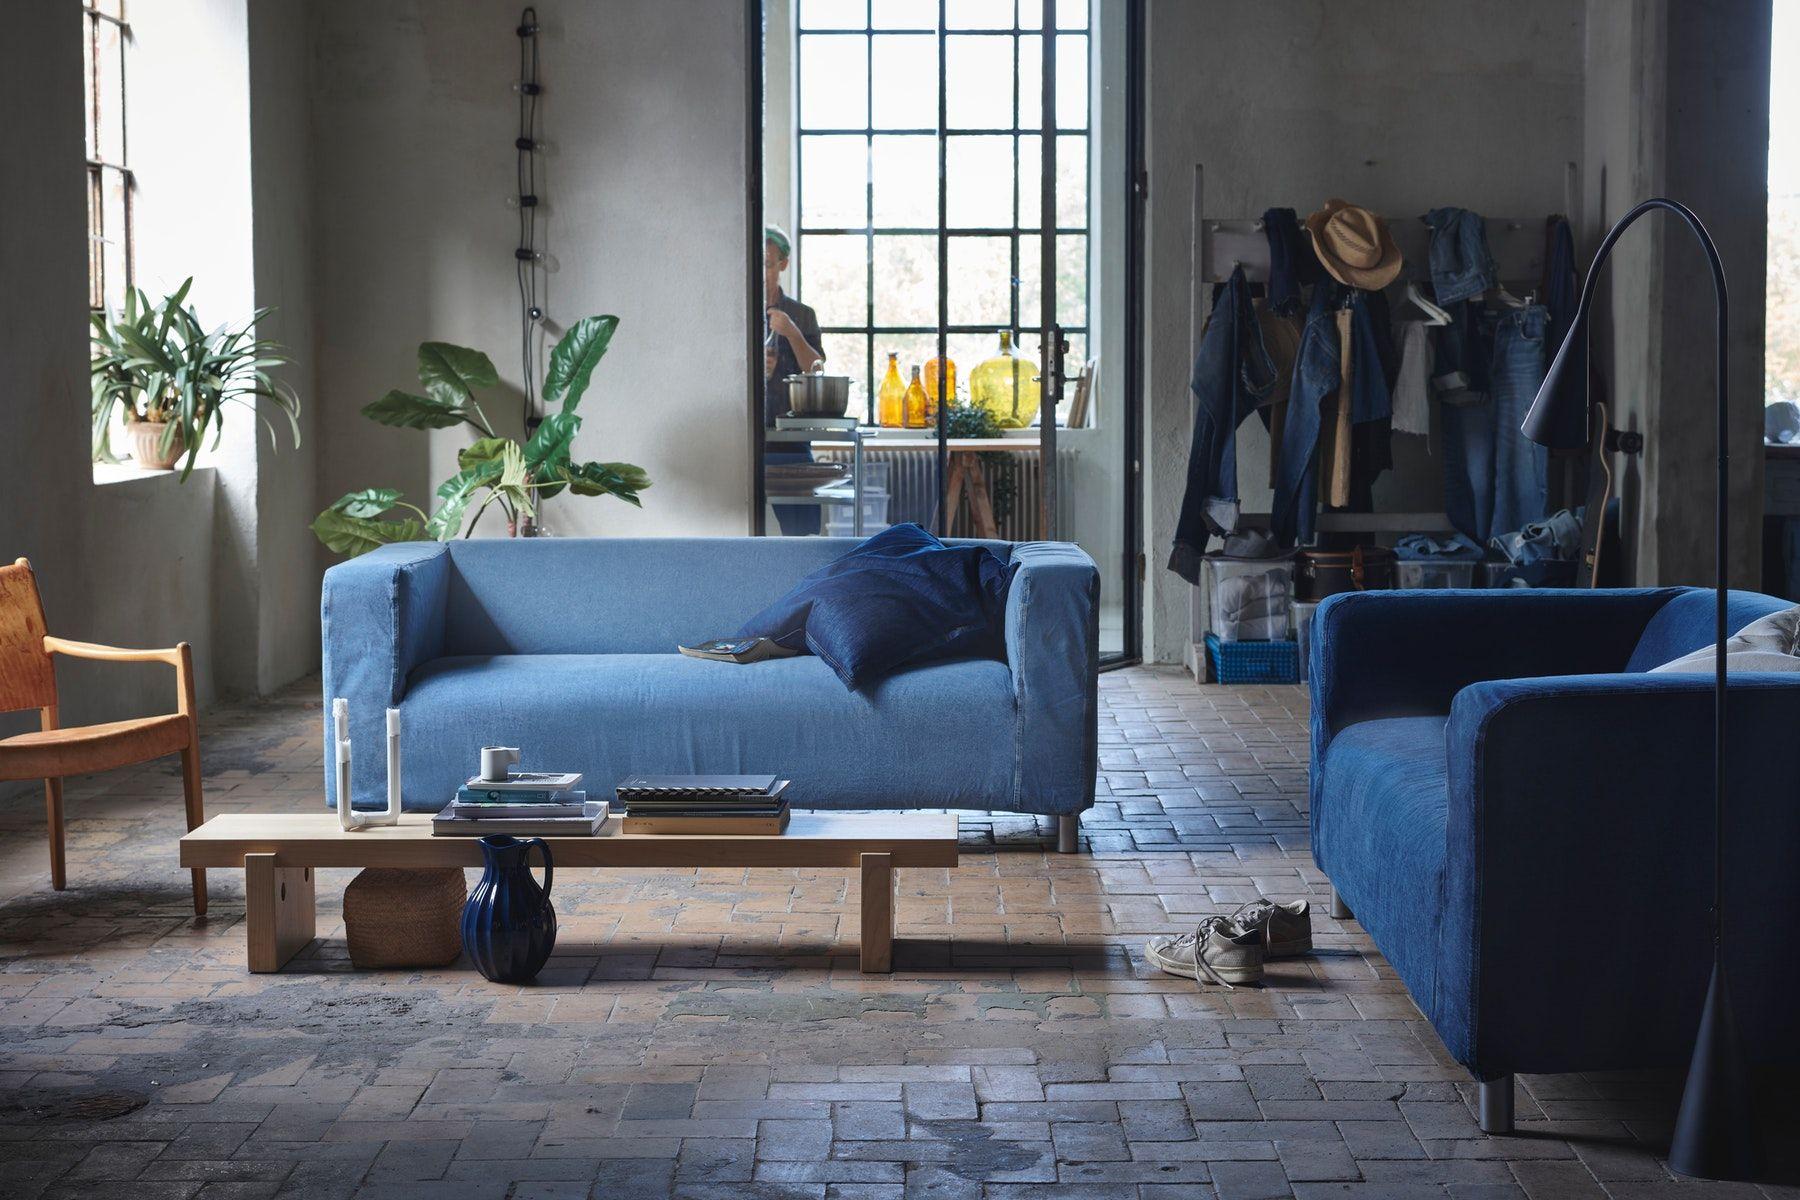 Ikea Love cover image